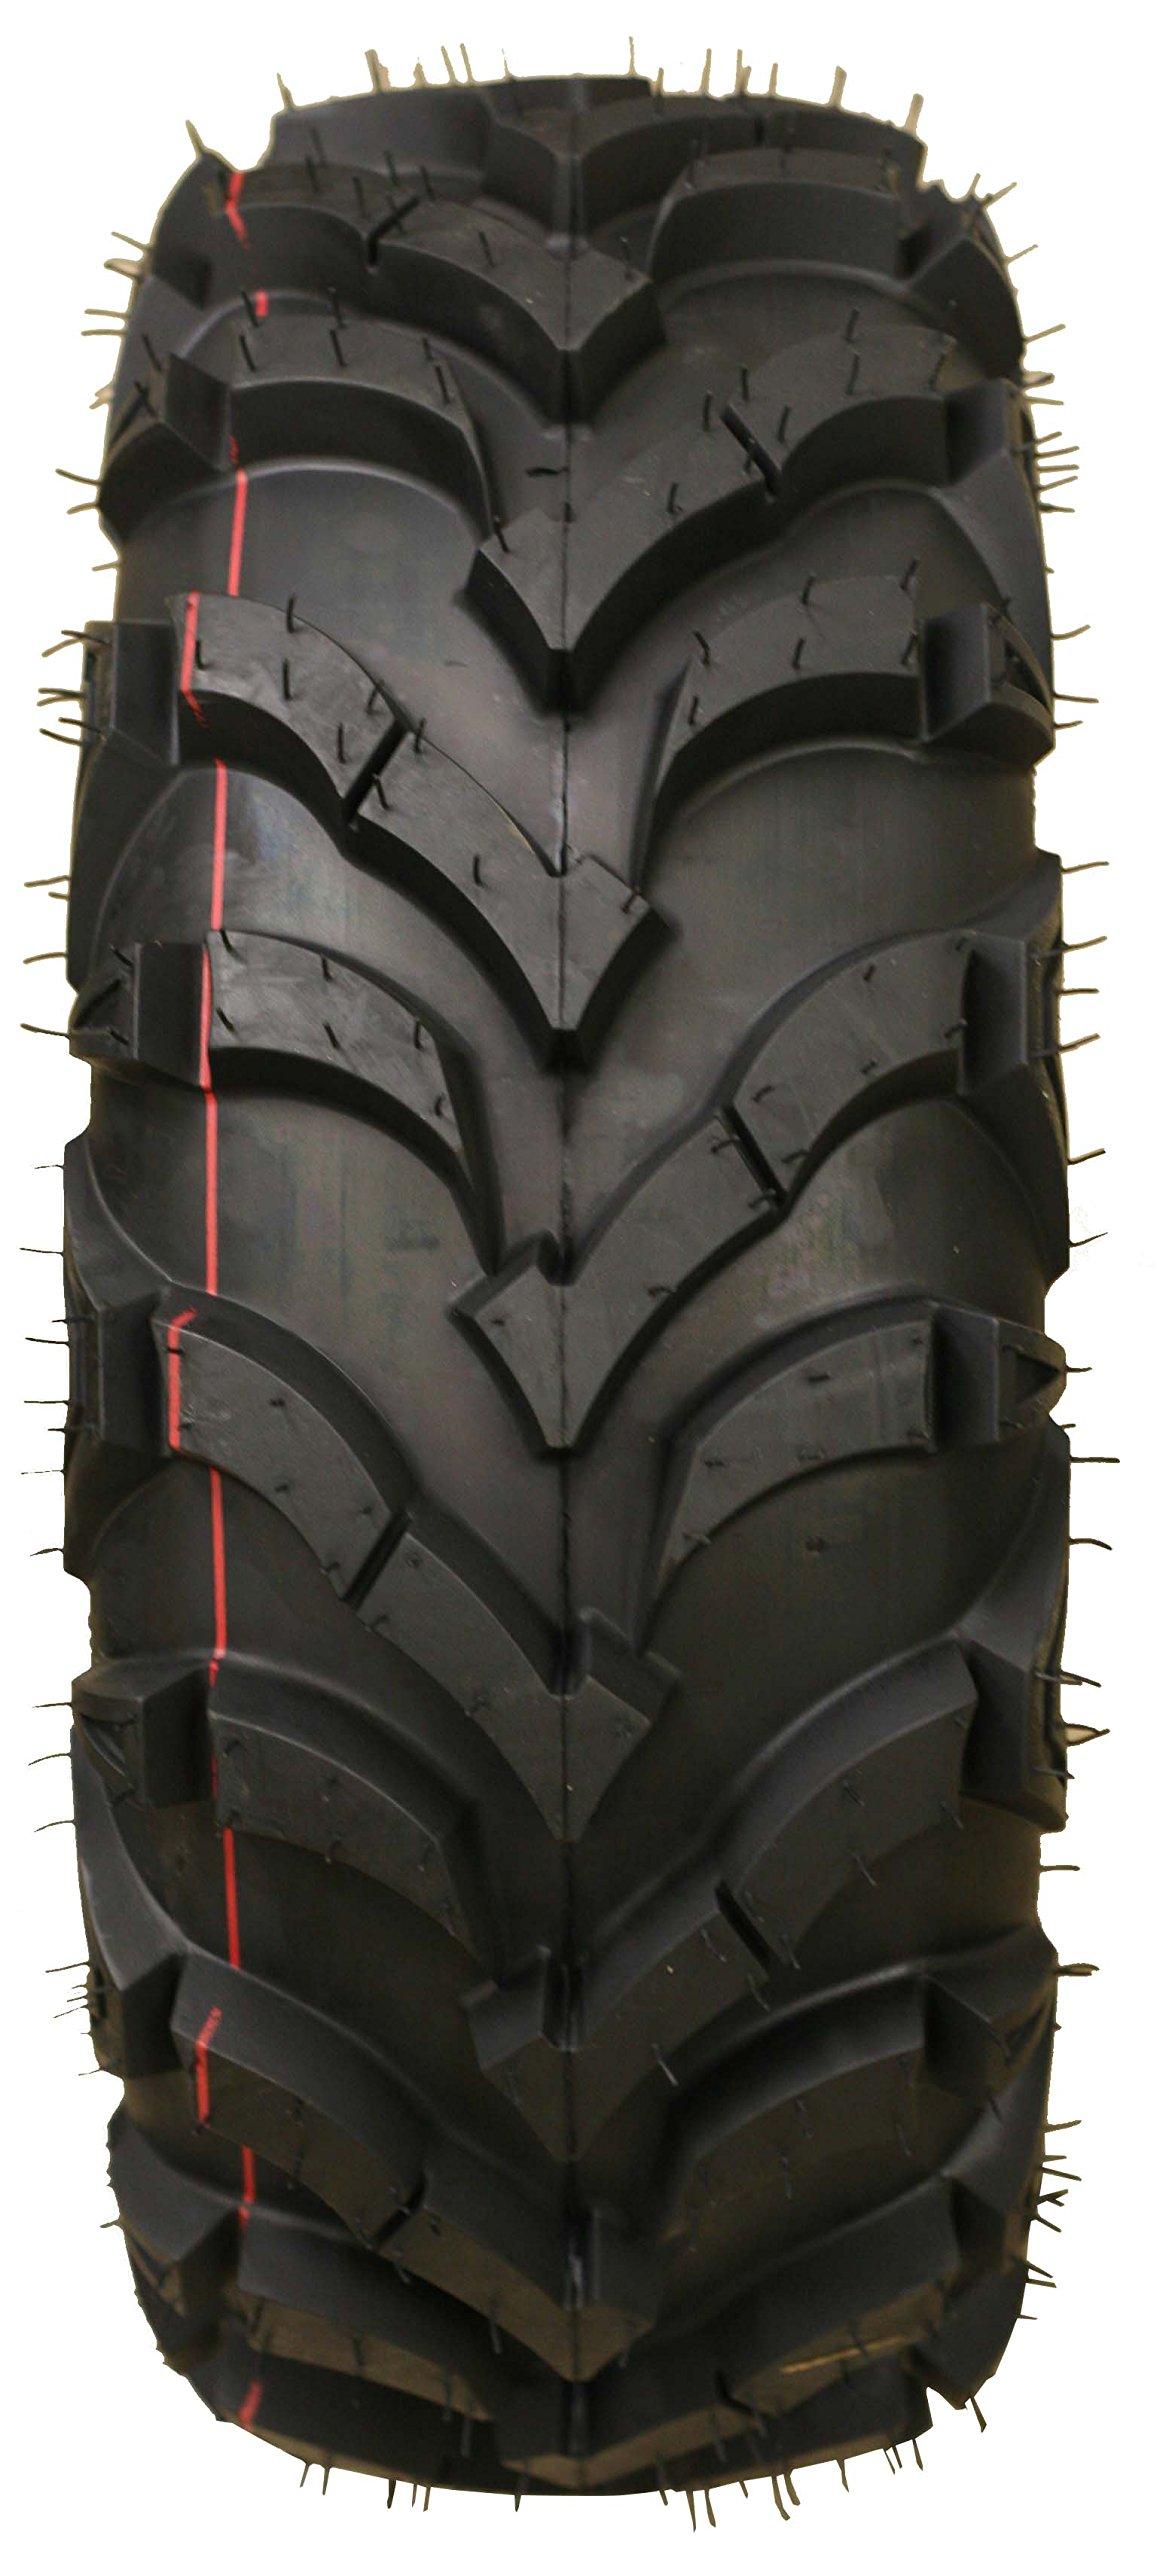 2 New WANDA ATV/UTV Tires 22x10-9 /6PR P341 -10251 … by Wanda (Image #2)